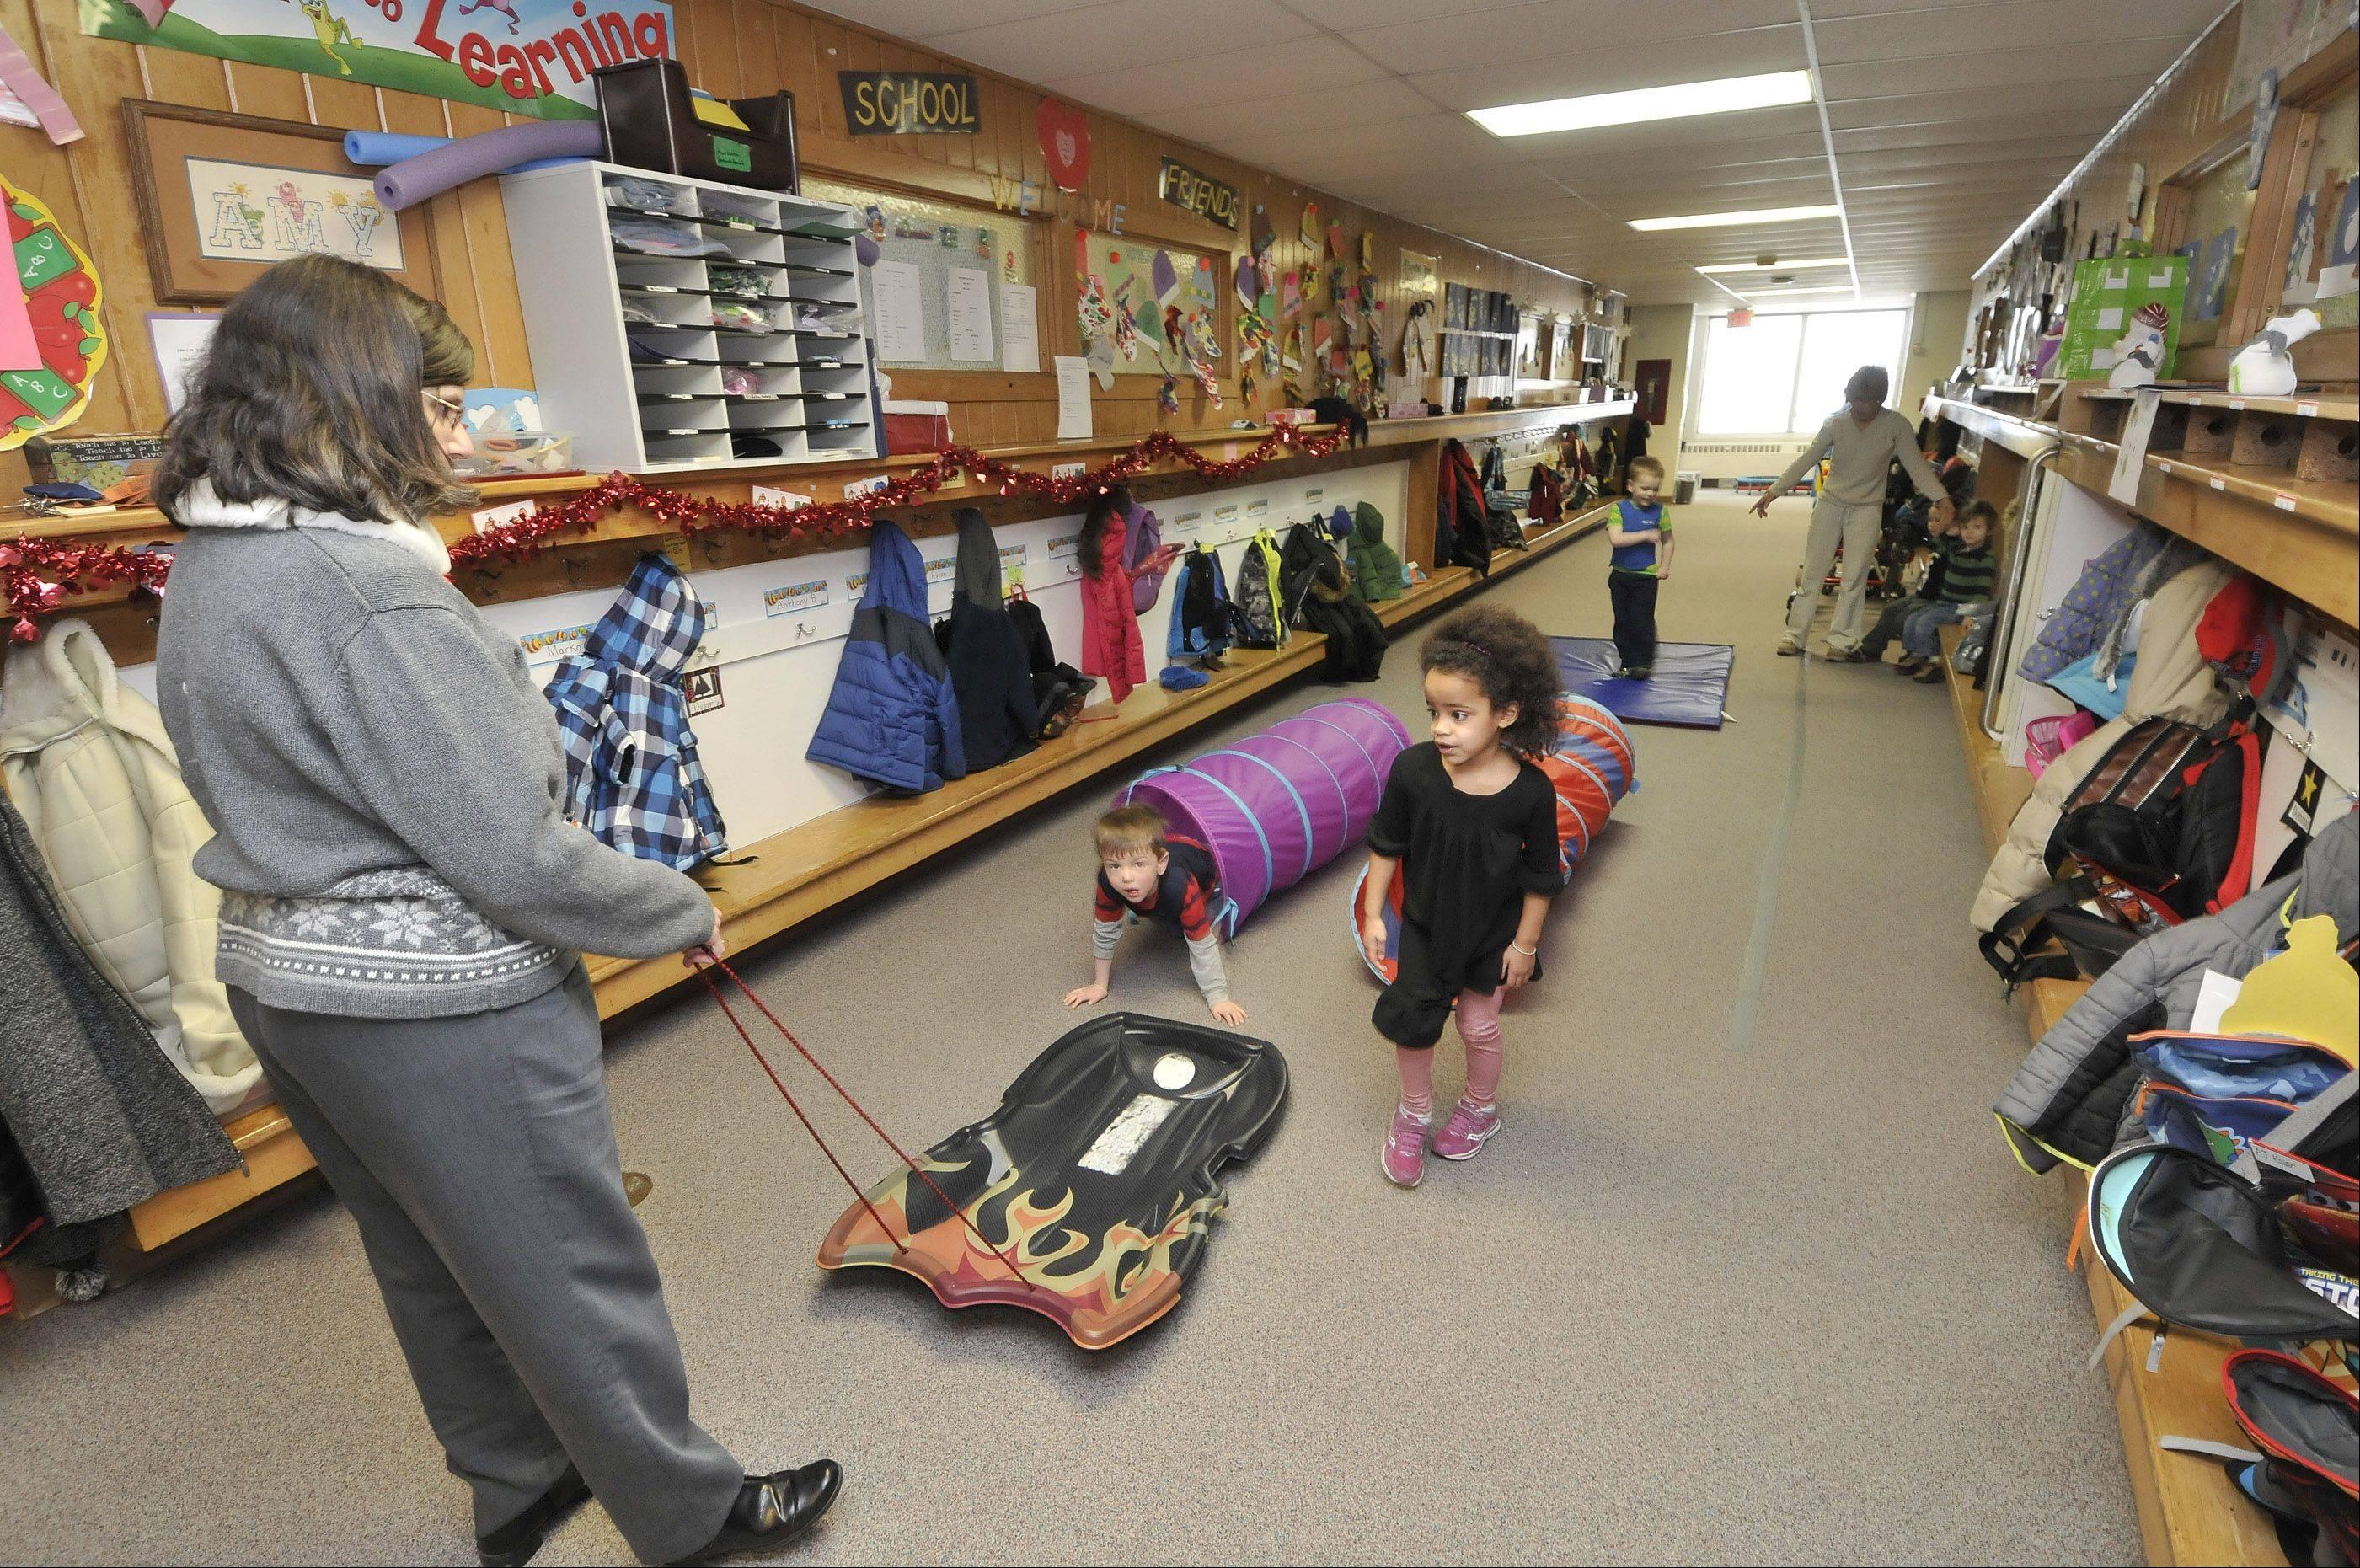 jefferson preschool wheaton district 200 voters must weigh cost of new school 731